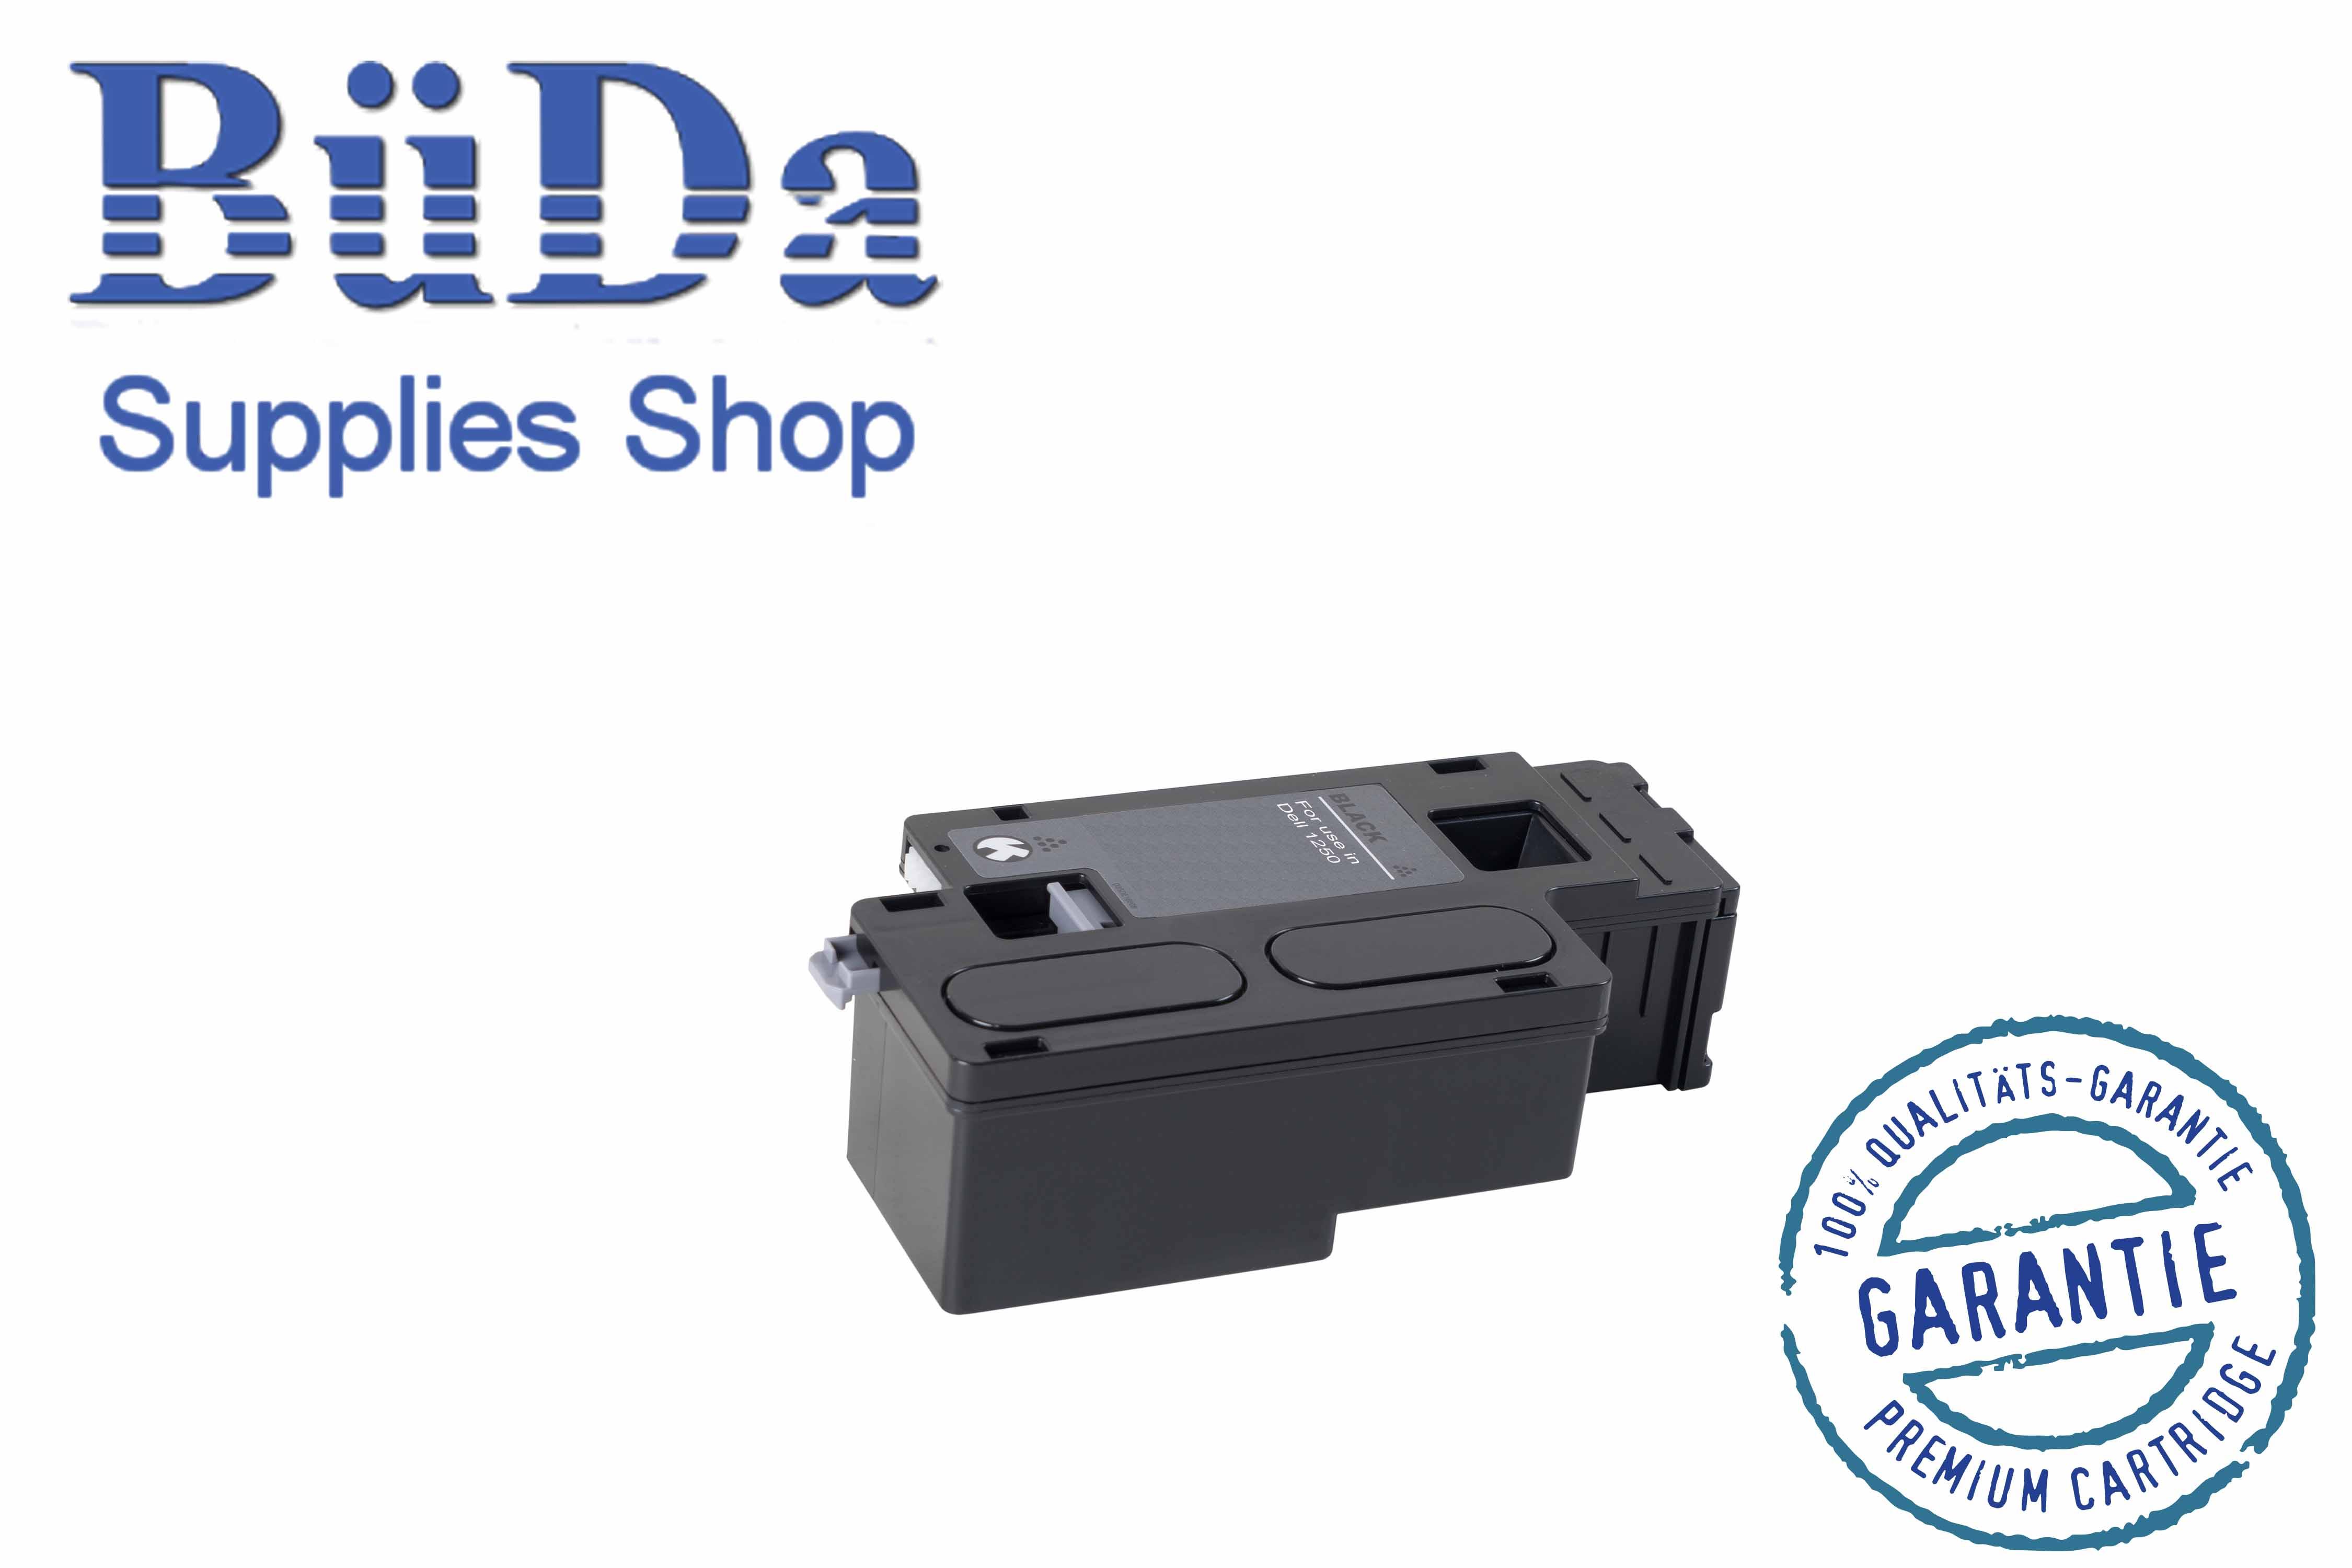 Toner-Modul komp. zu Dell 1250 black 2200 Seiten